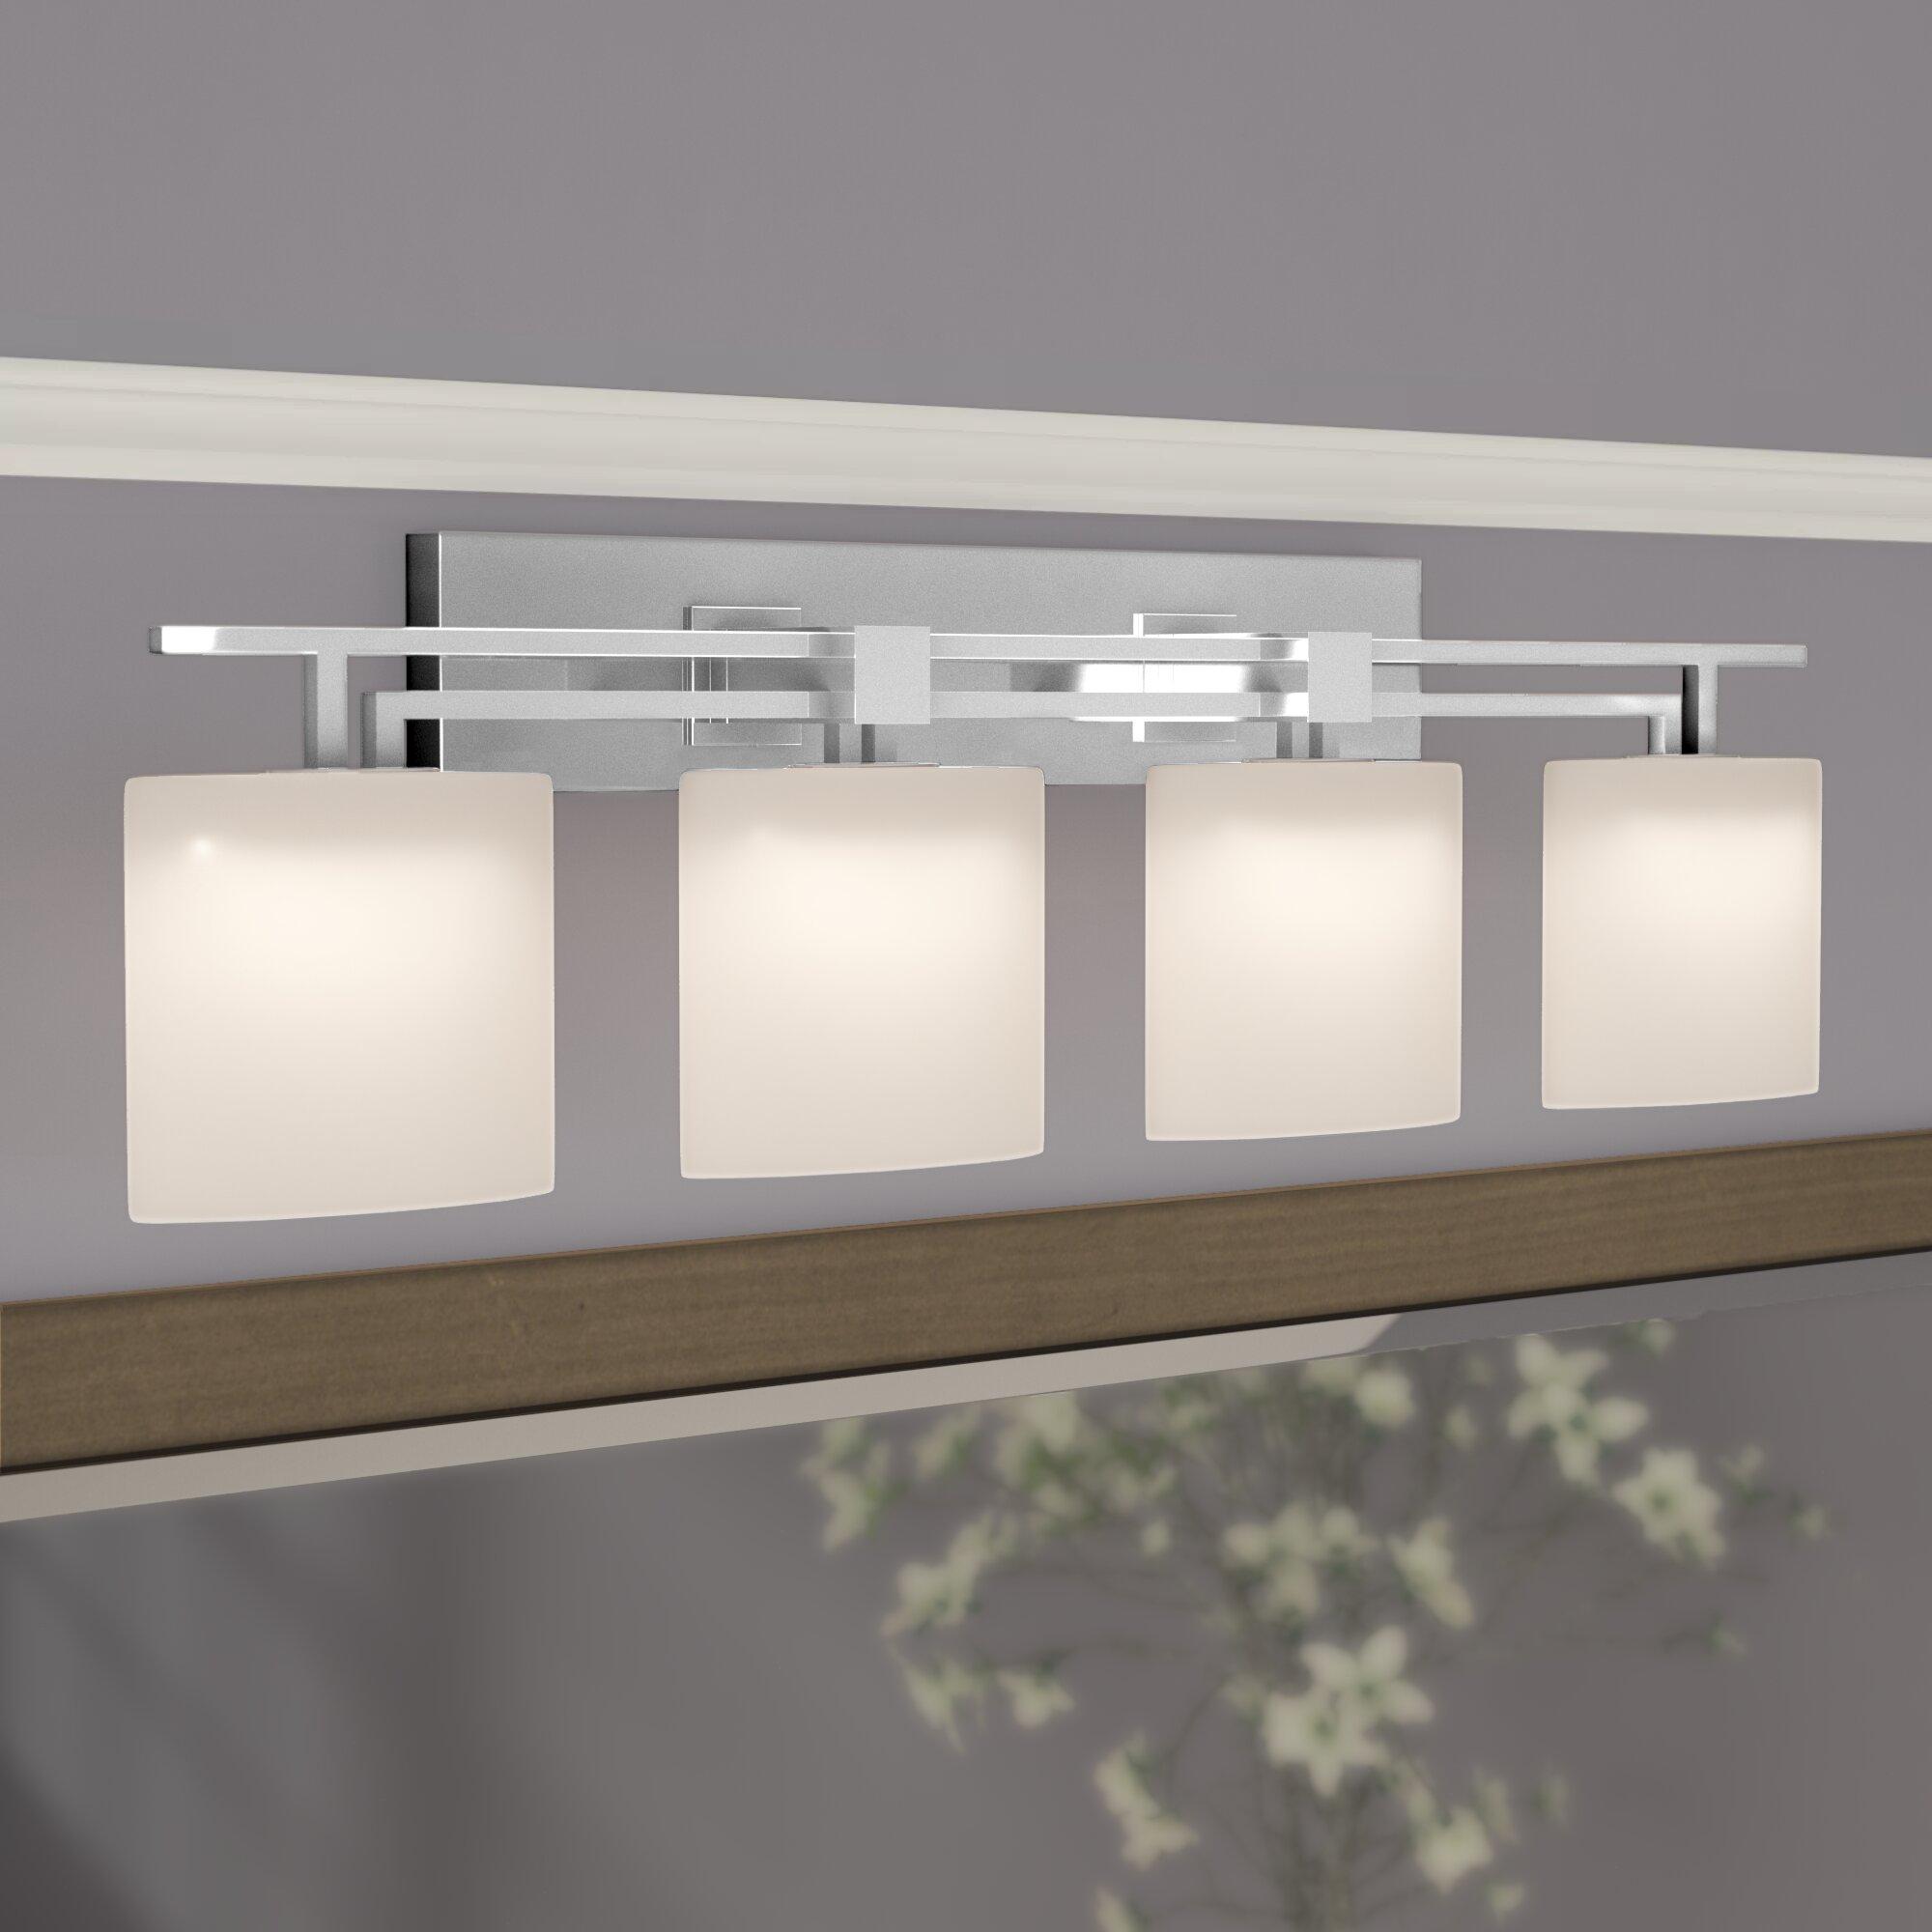 Brayden Studio Luzerne Aero 4 Light Oval Bath Vanity Light